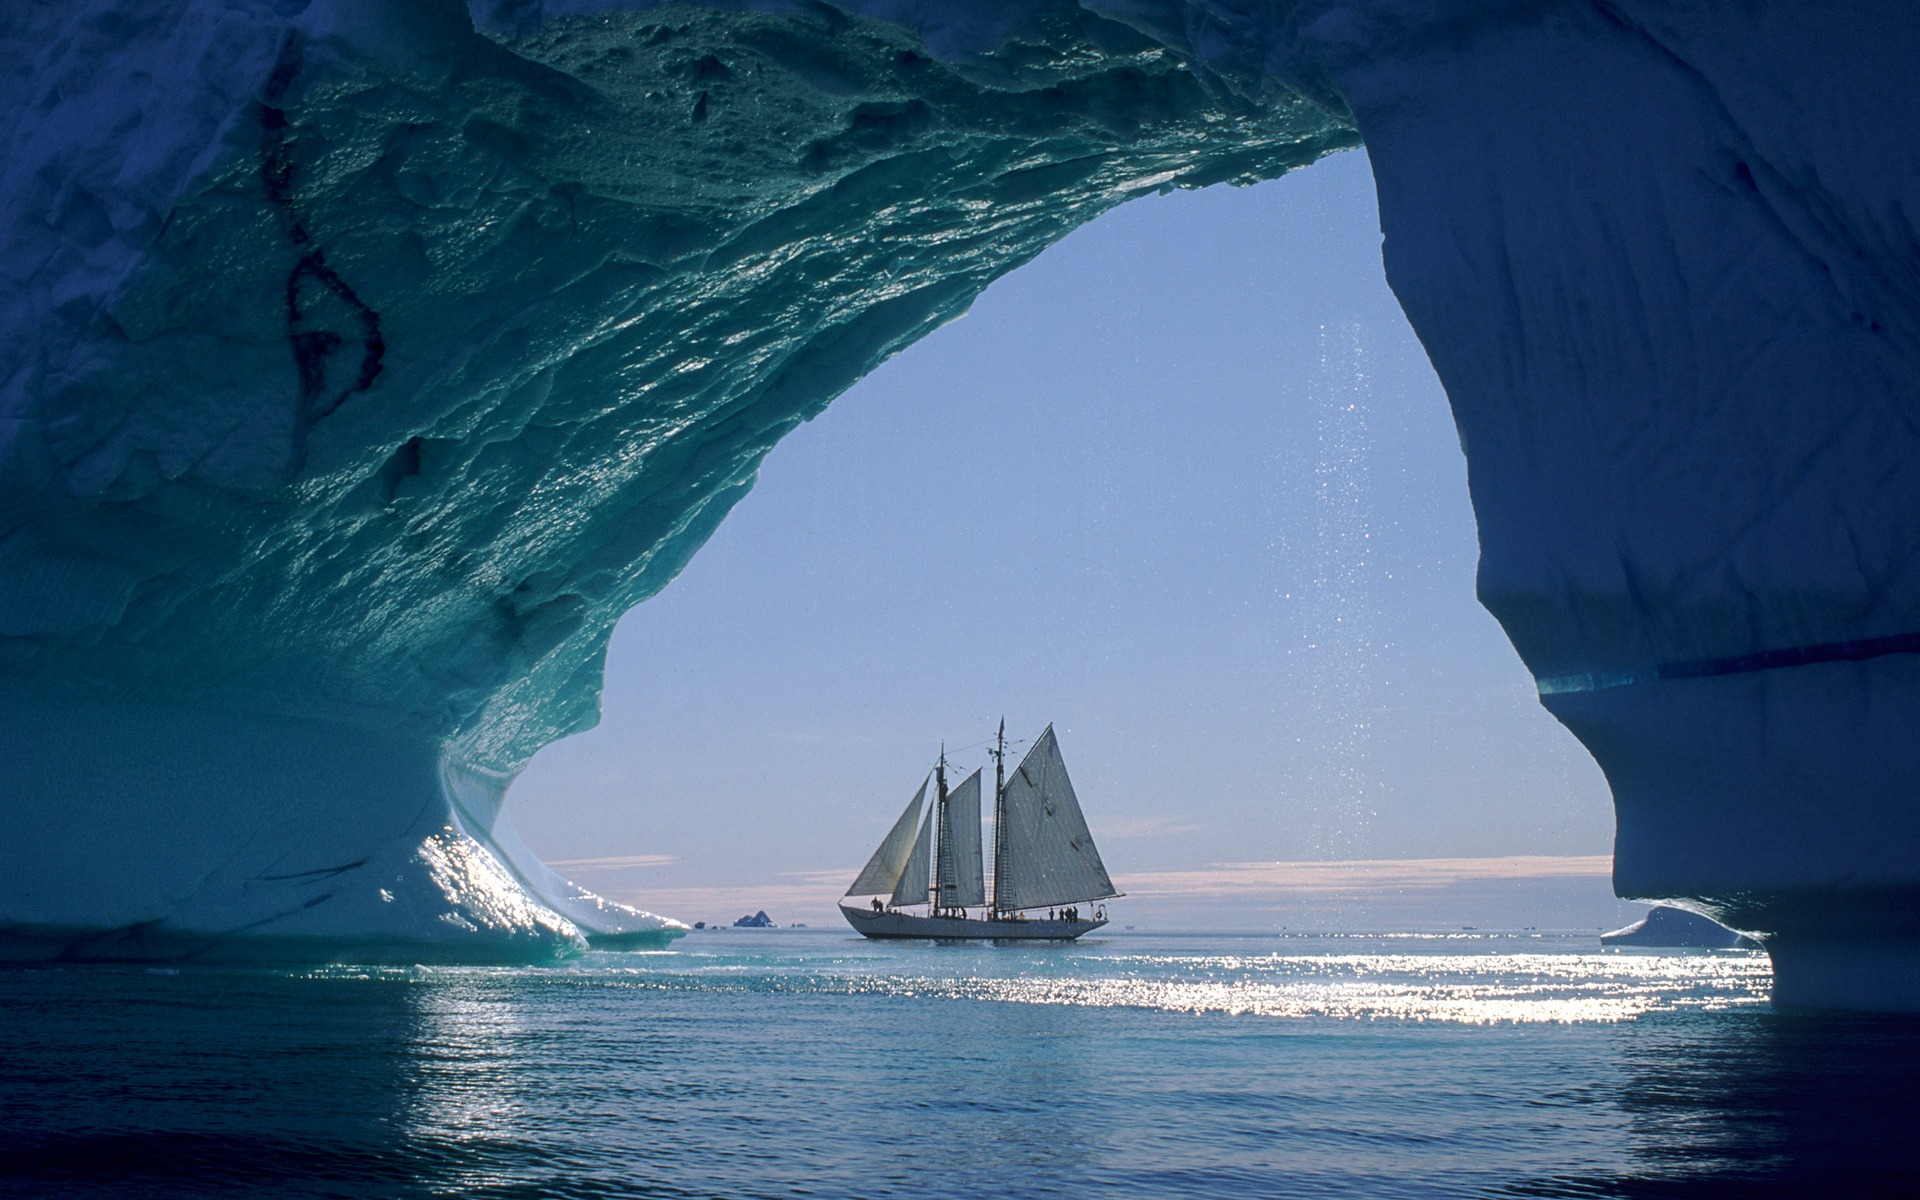 sailboat wallpaper 7777